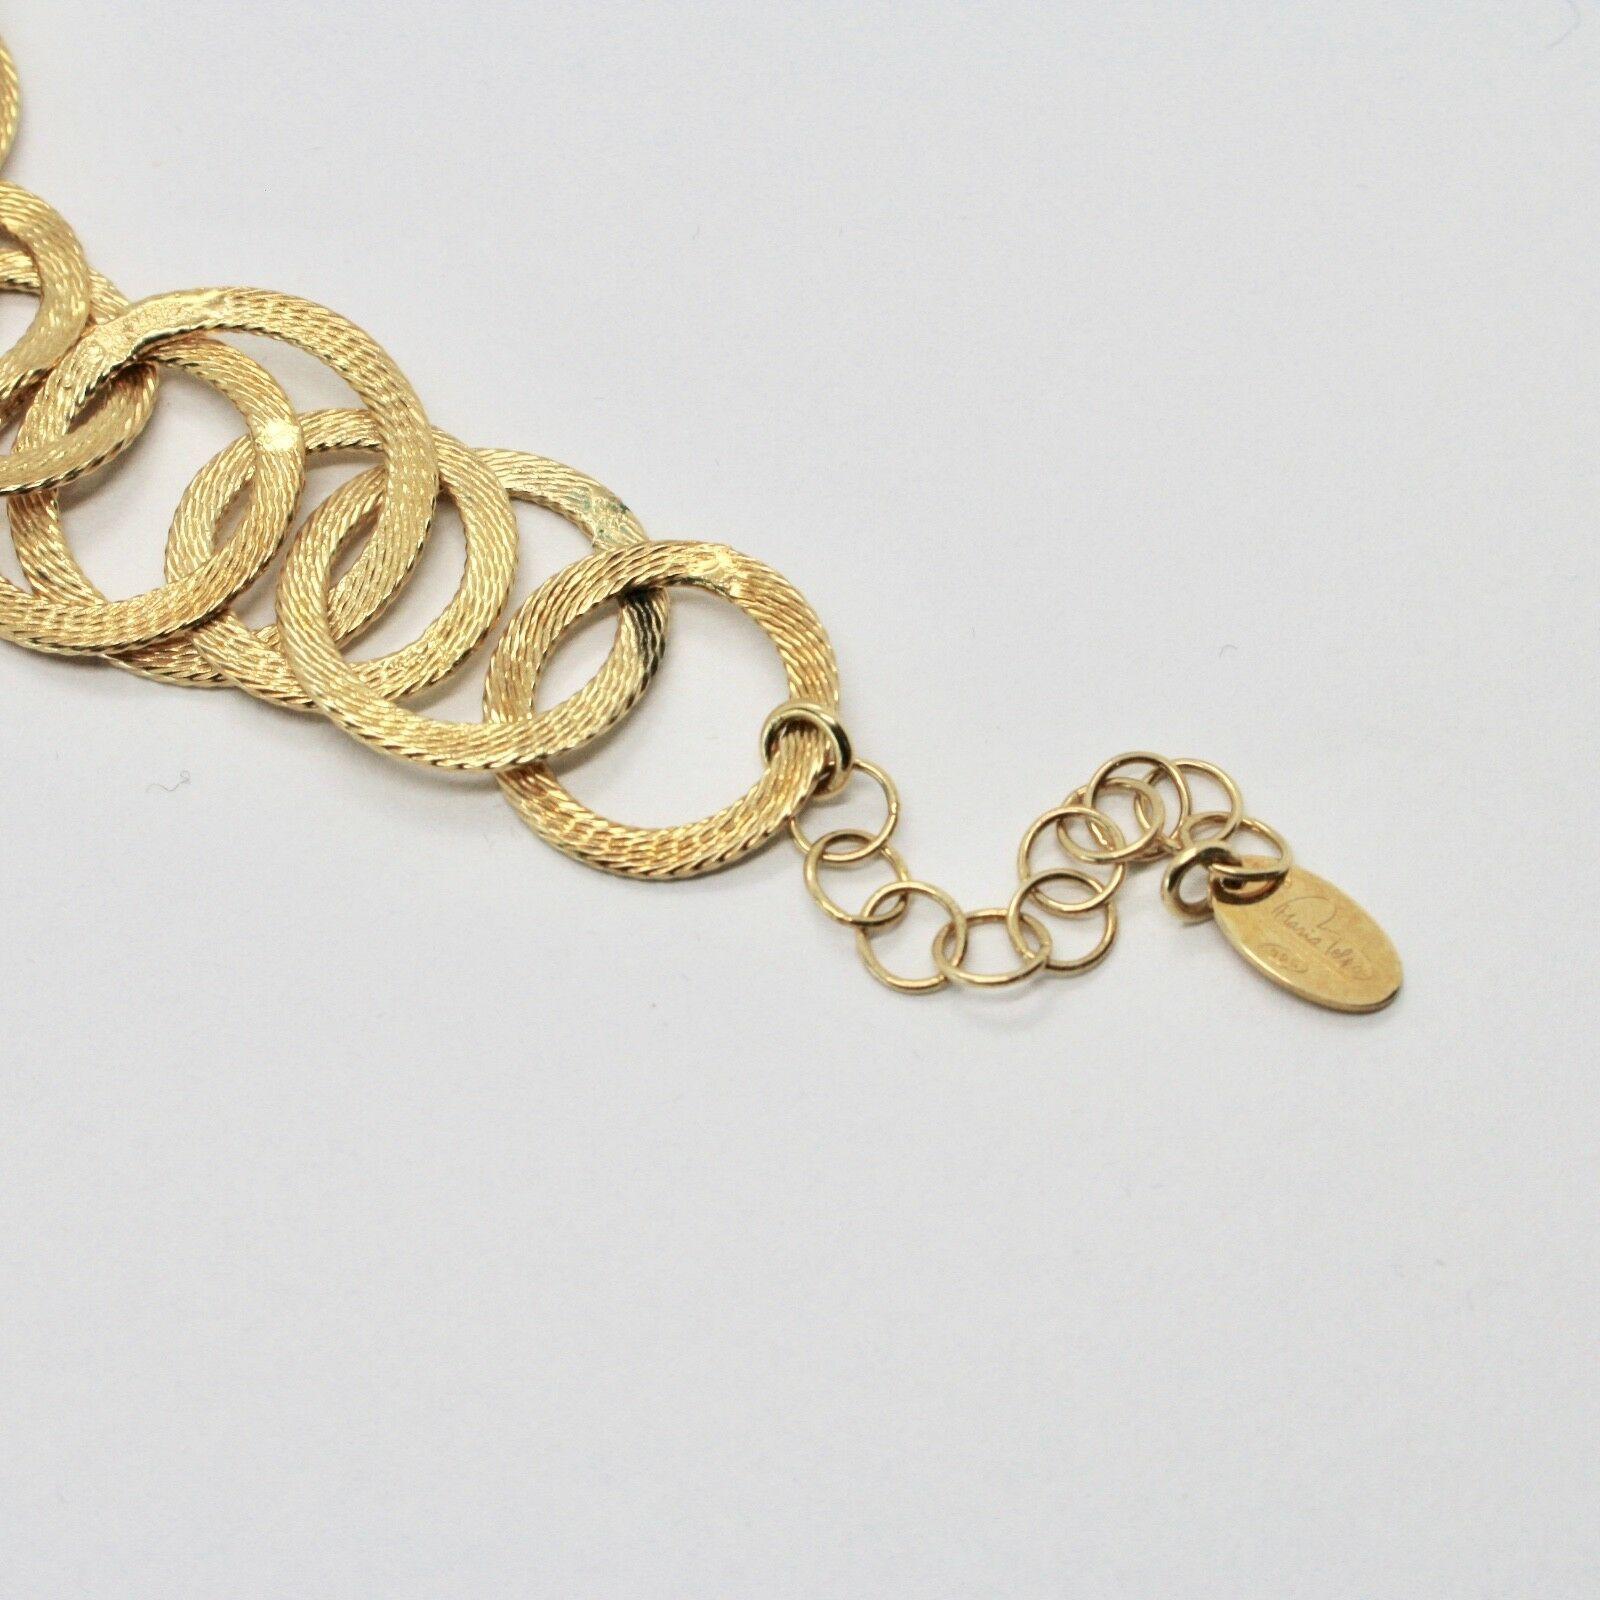 Silber Armband 925 Folie Gold Kreise Mattiert By Maria Ielpo Made in Italy